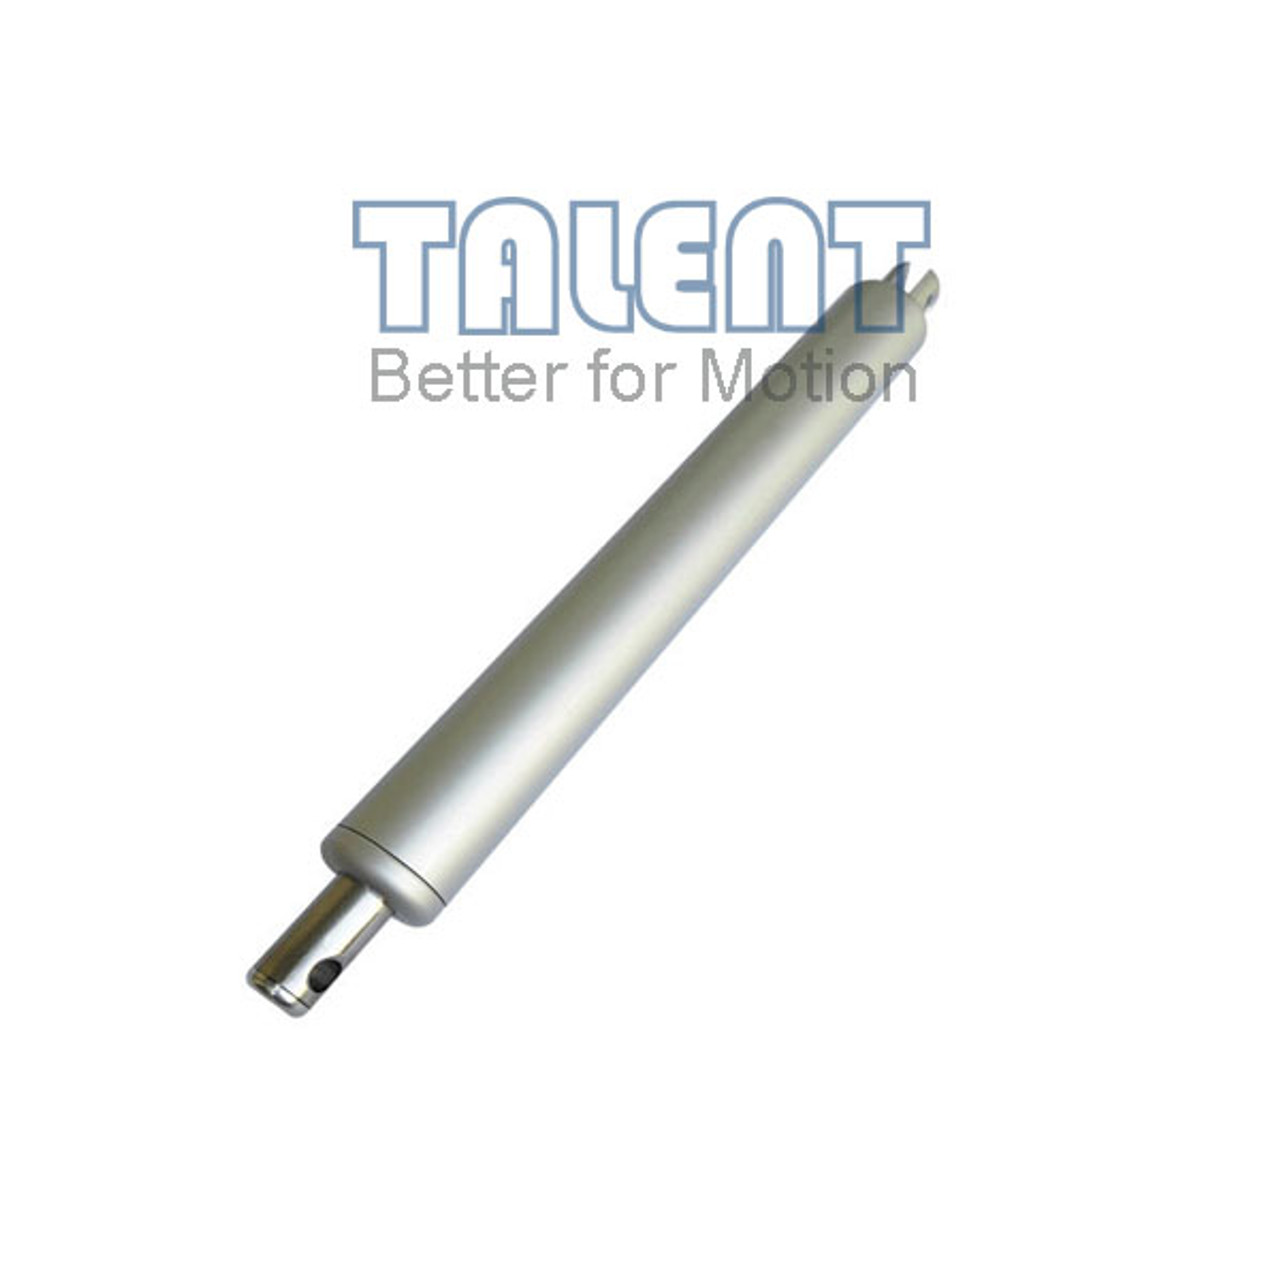 20mm tubular linear actuator, 30N force linear push rod